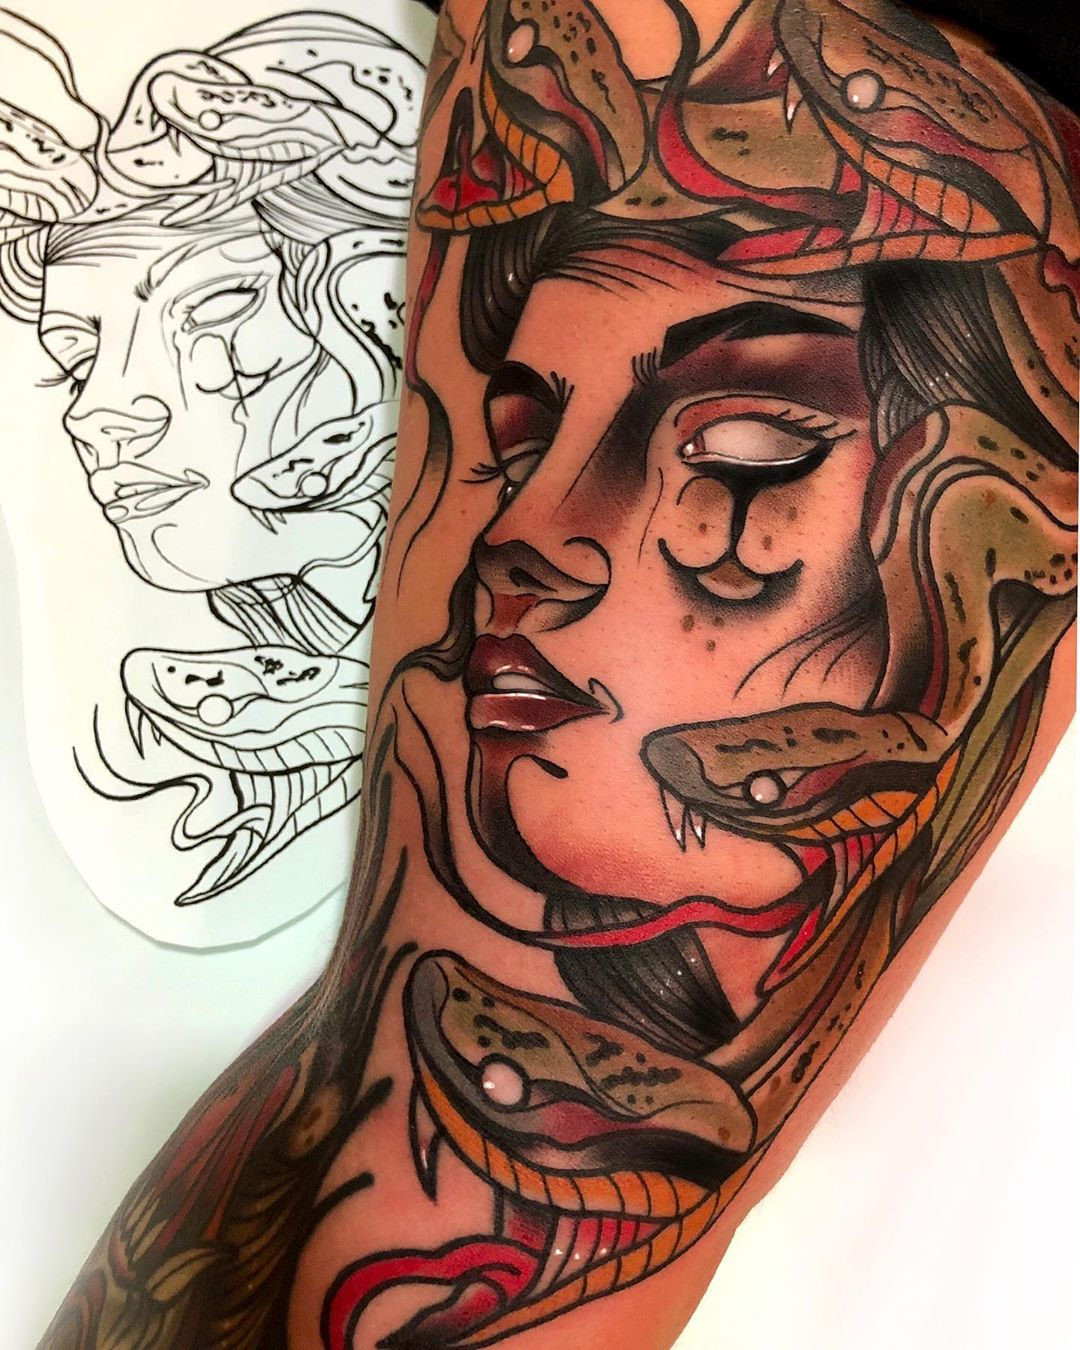 neotraditionaltattoo,followforfollow,berlin,followmeciudadreal,ciudadreal,tomelloso,almagro,puertollano,tatuajesenpuertollano,tatuajesendaimiel,ciudadrealtattoo,ciudadrealtatuajes,tatuajesciudadreal,follow,ciudadrealtatuajes,puertollano,tattooers,besttattooers,juantabasco,ciudadrealsetatua,ink,tatuajes,realismo,realistictattoo,ciudadrealtattoo,tatuajesenpuertollano,traditionaltattoos,castillalamancha,ink,tattooart,zurichtattoo,daimiel,inkedgirls,inkig,ink,inktattoosb